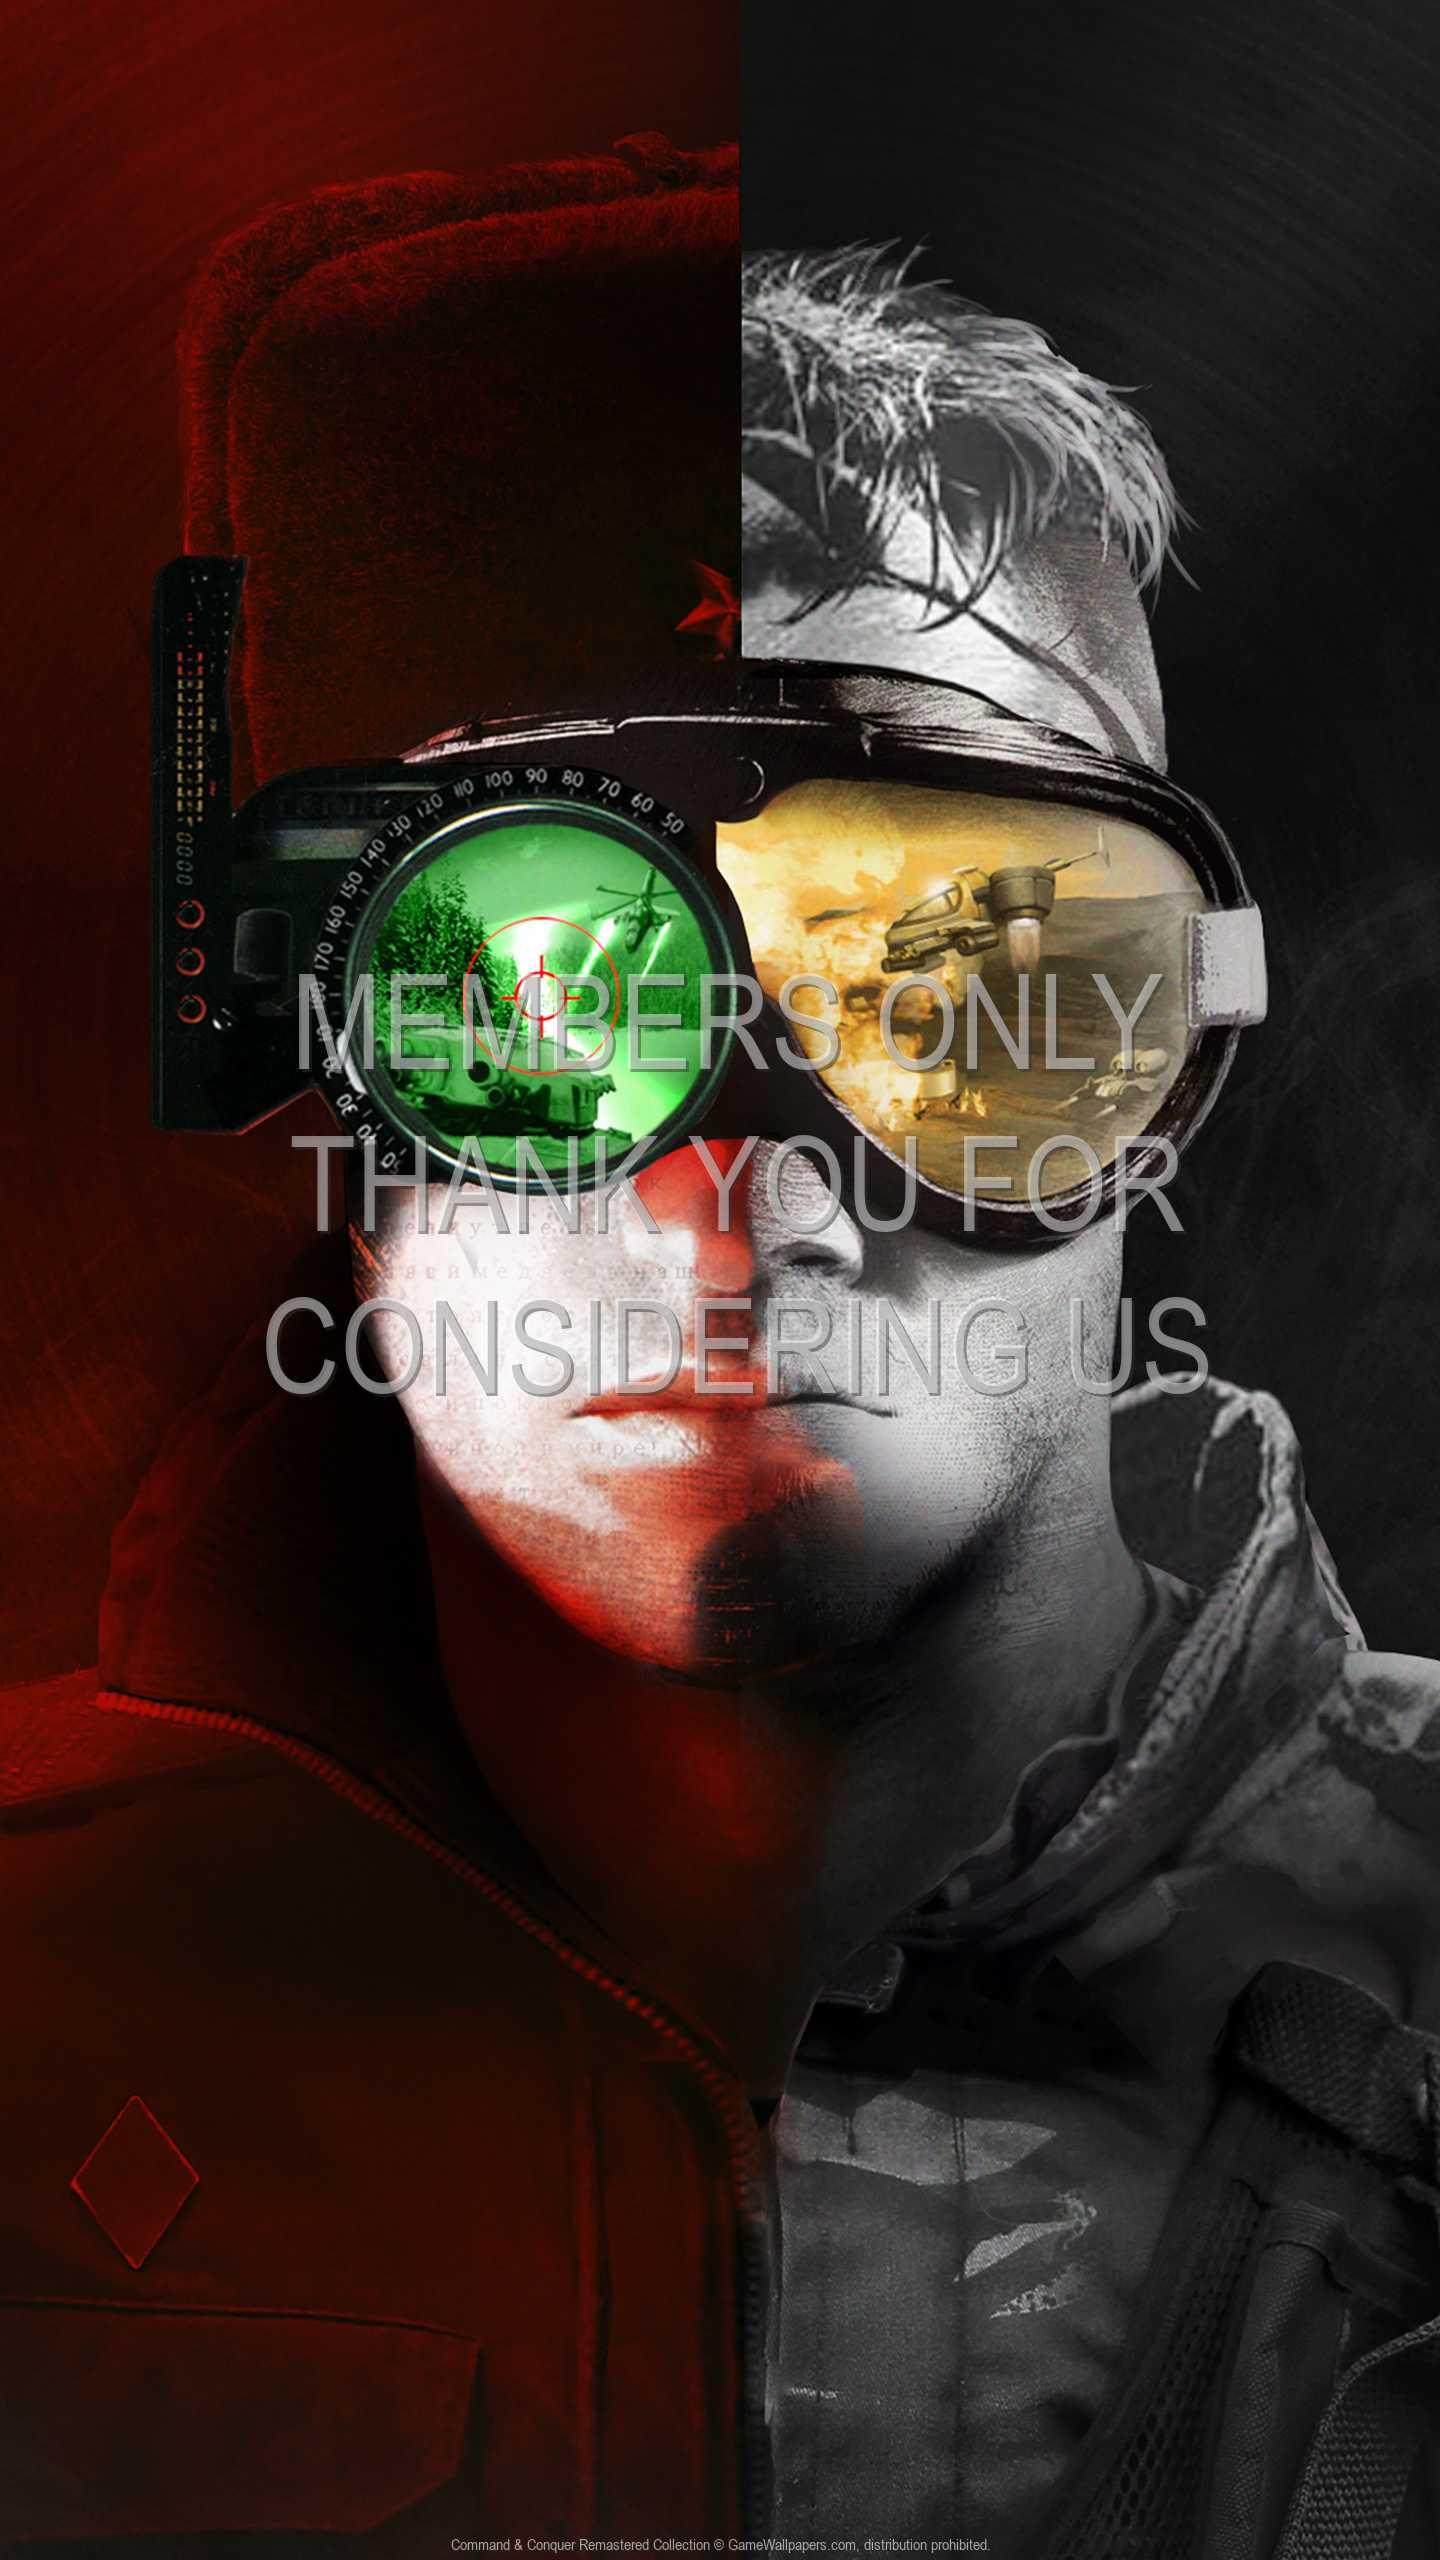 Command & Conquer Remastered Collection 1440p Vertical Handy Hintergrundbild 01